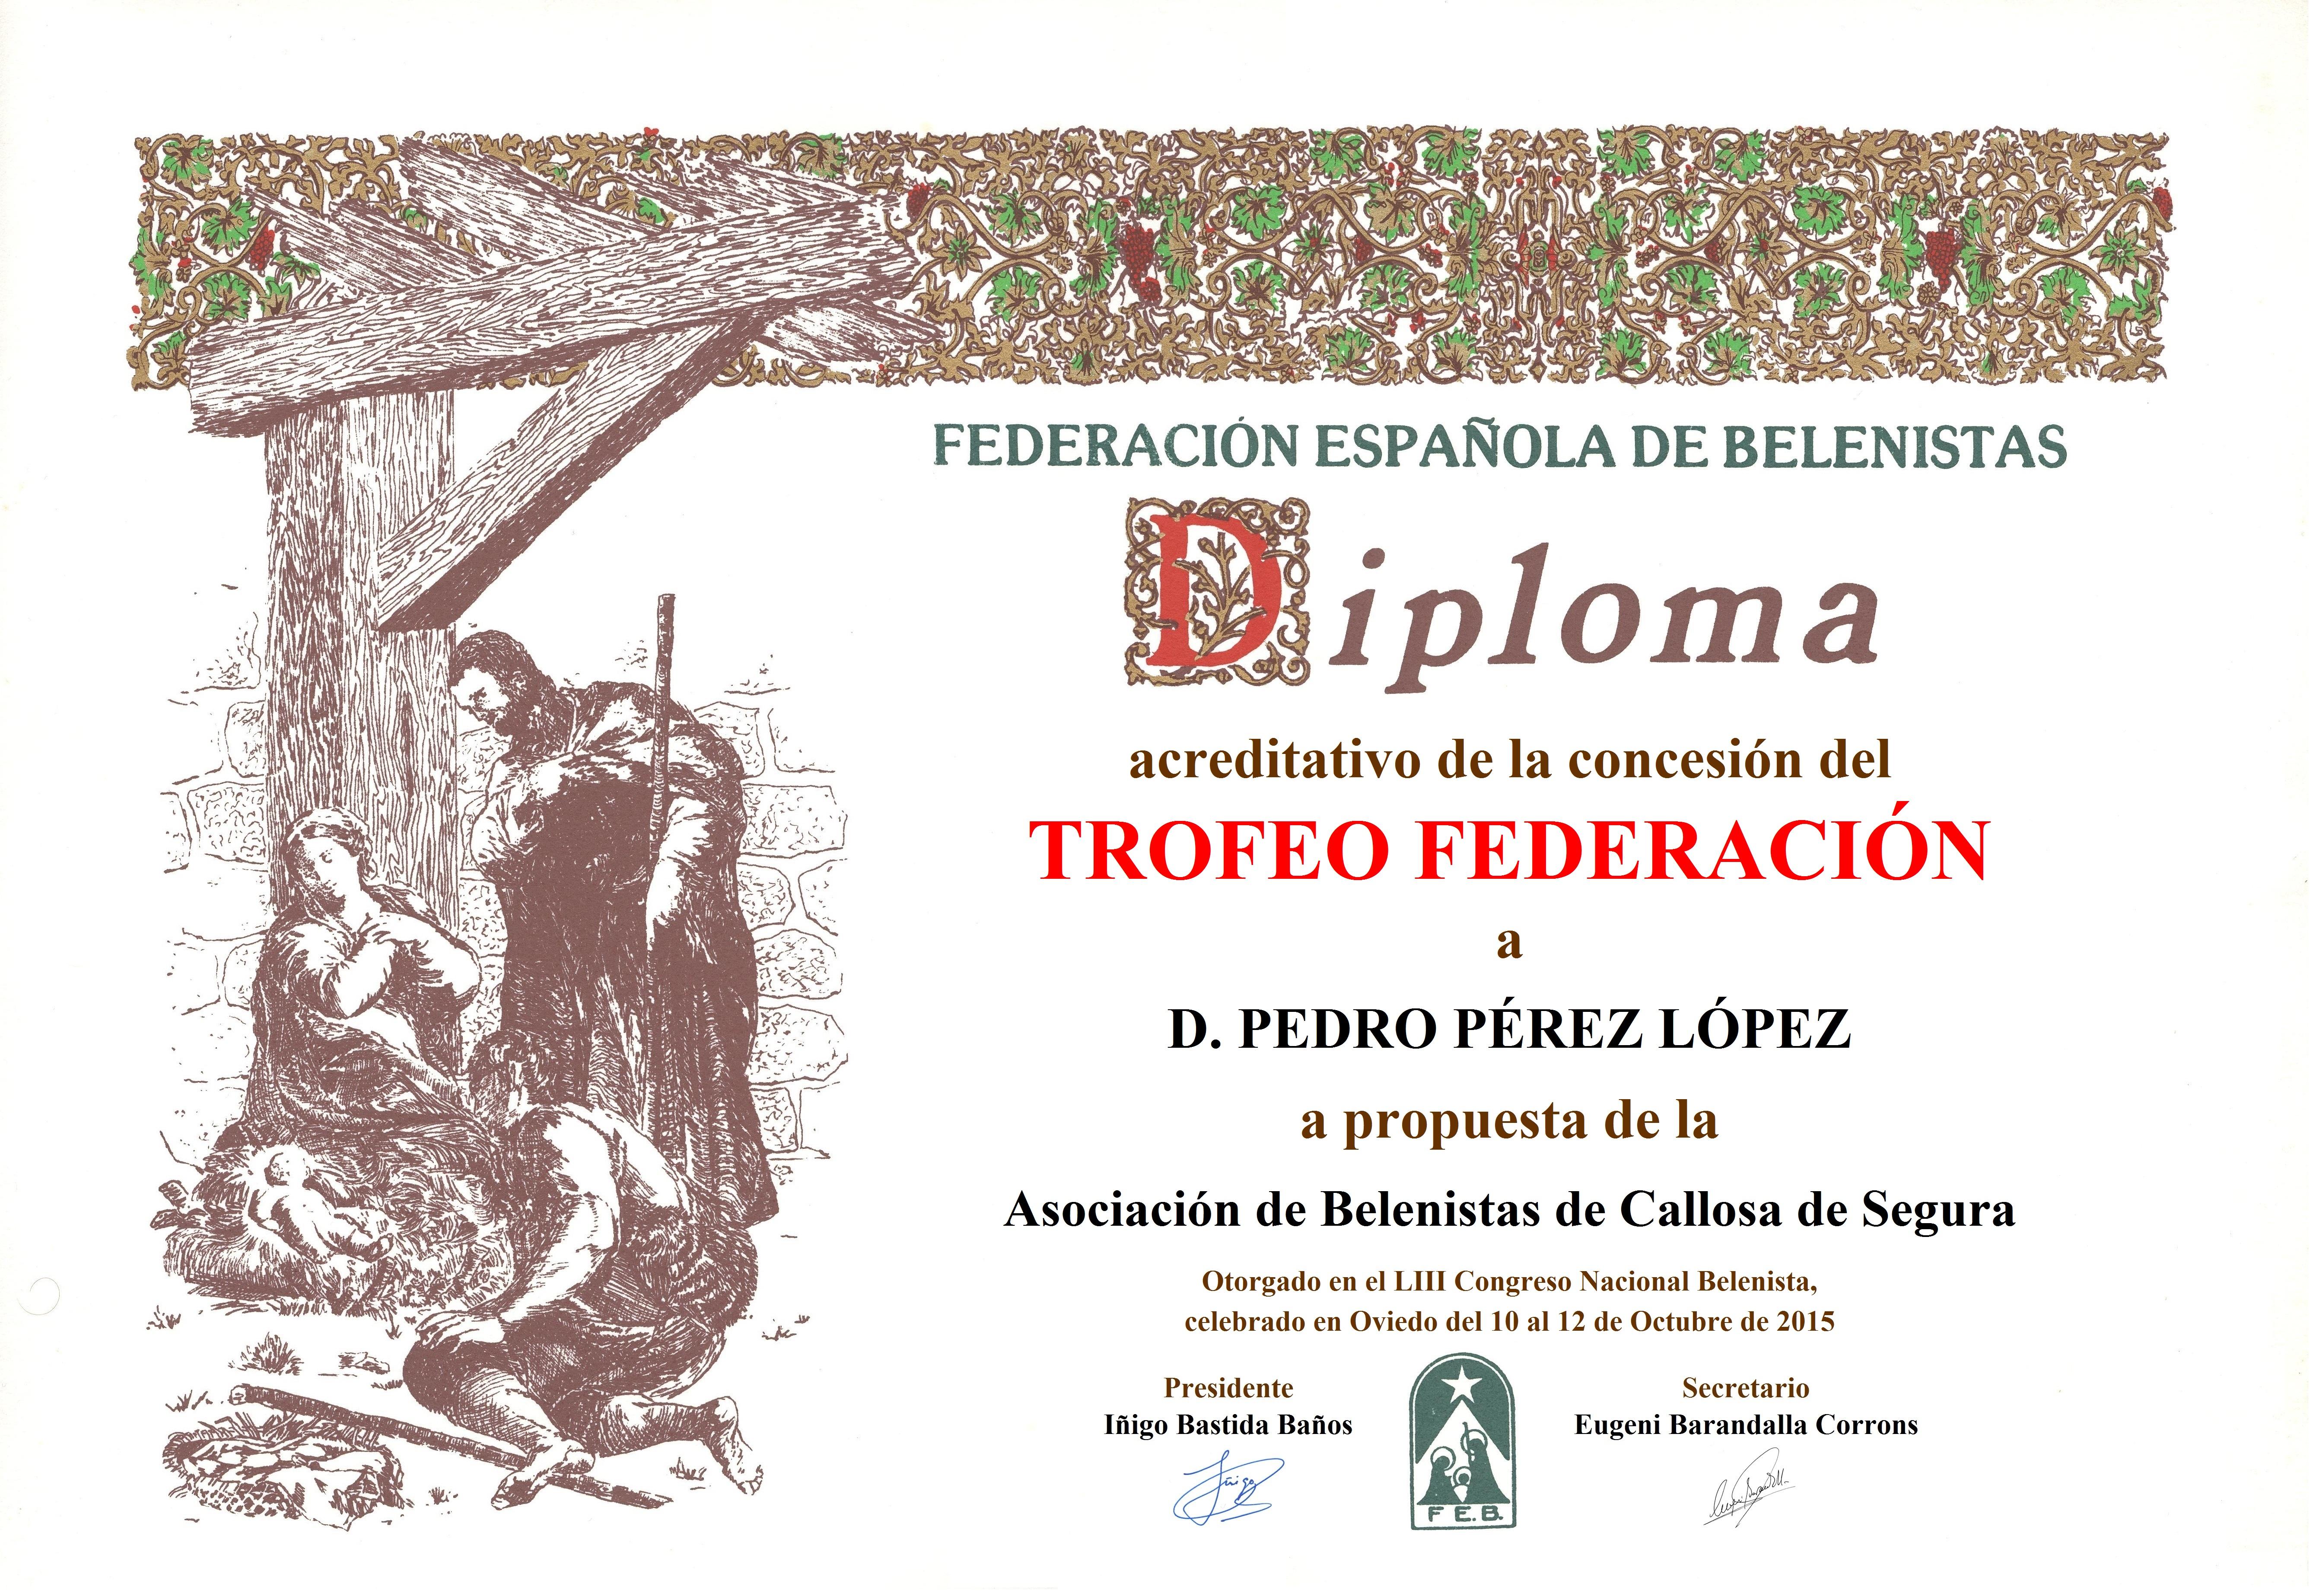 Diploma Trofeo FEB 2015 Pedro Pérez López